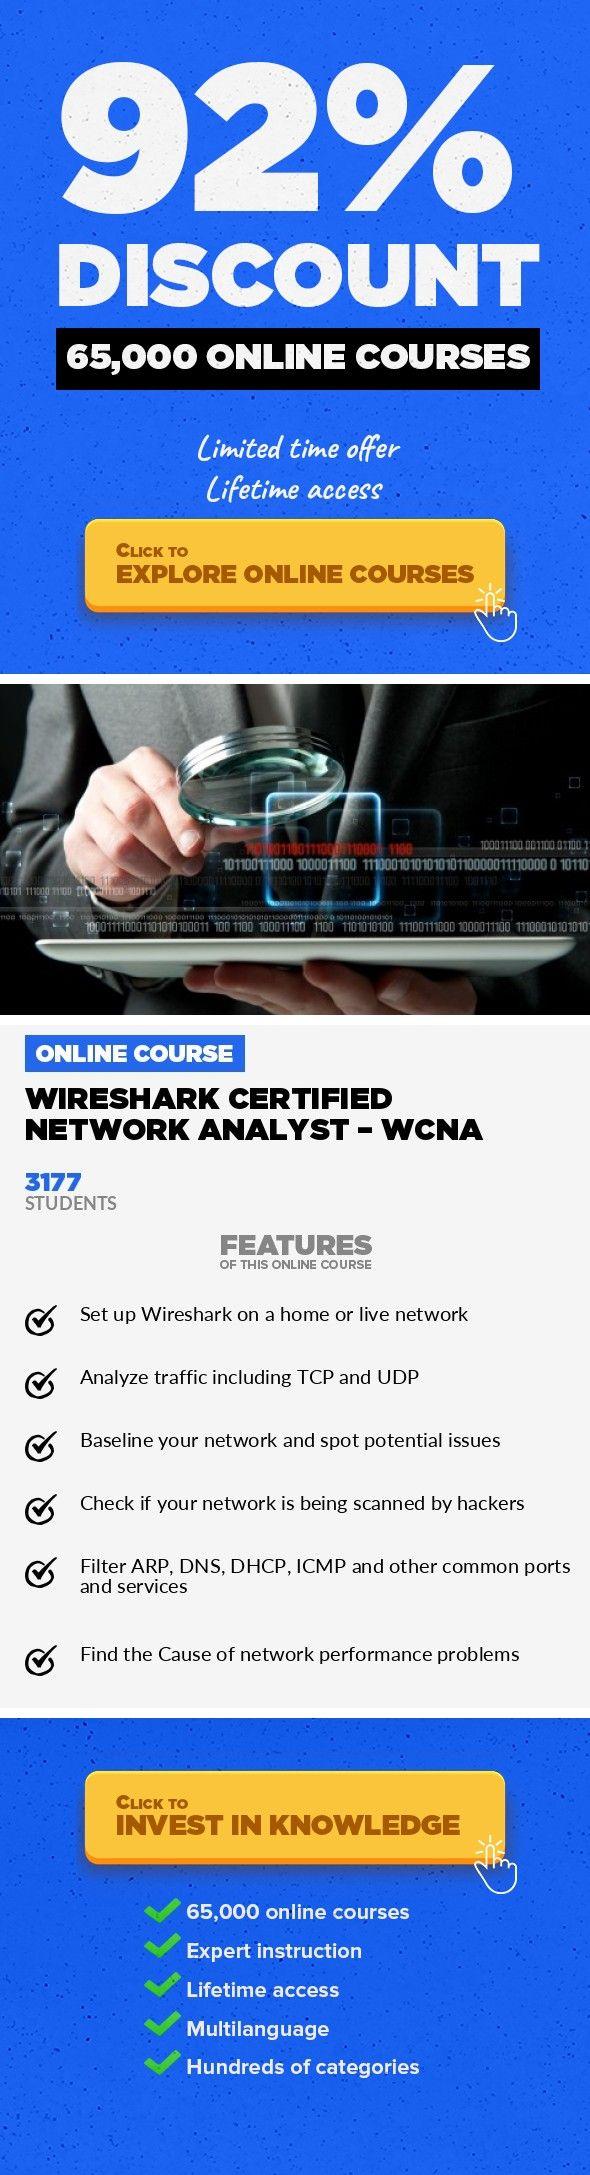 Wireshark Certified Network Analyst Wcna It Certification It